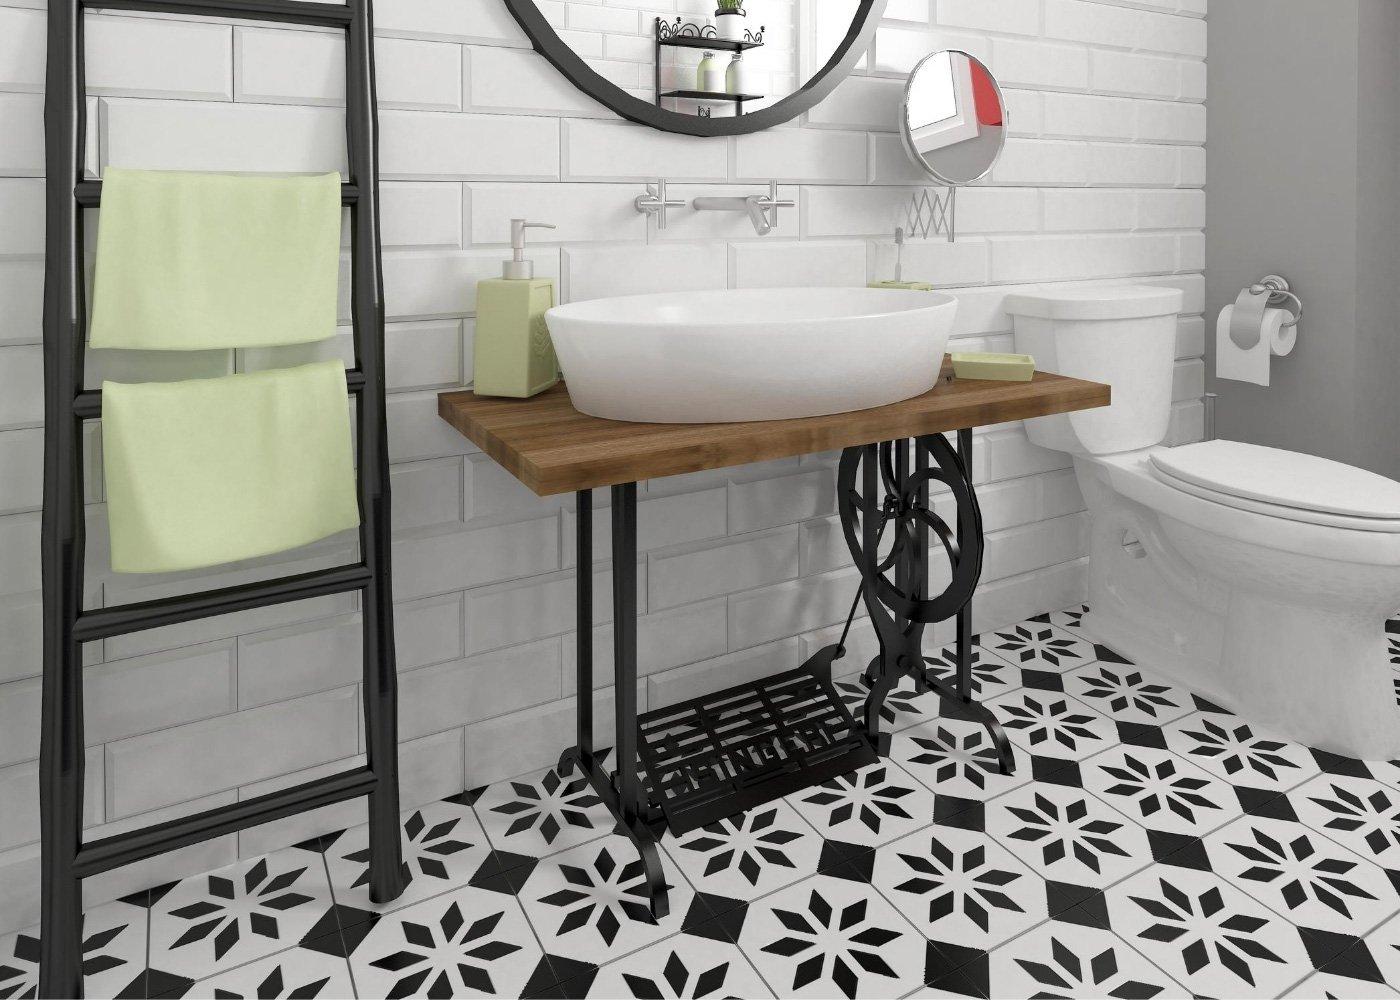 Best-Tile-for-Small-Bathroom-Floor